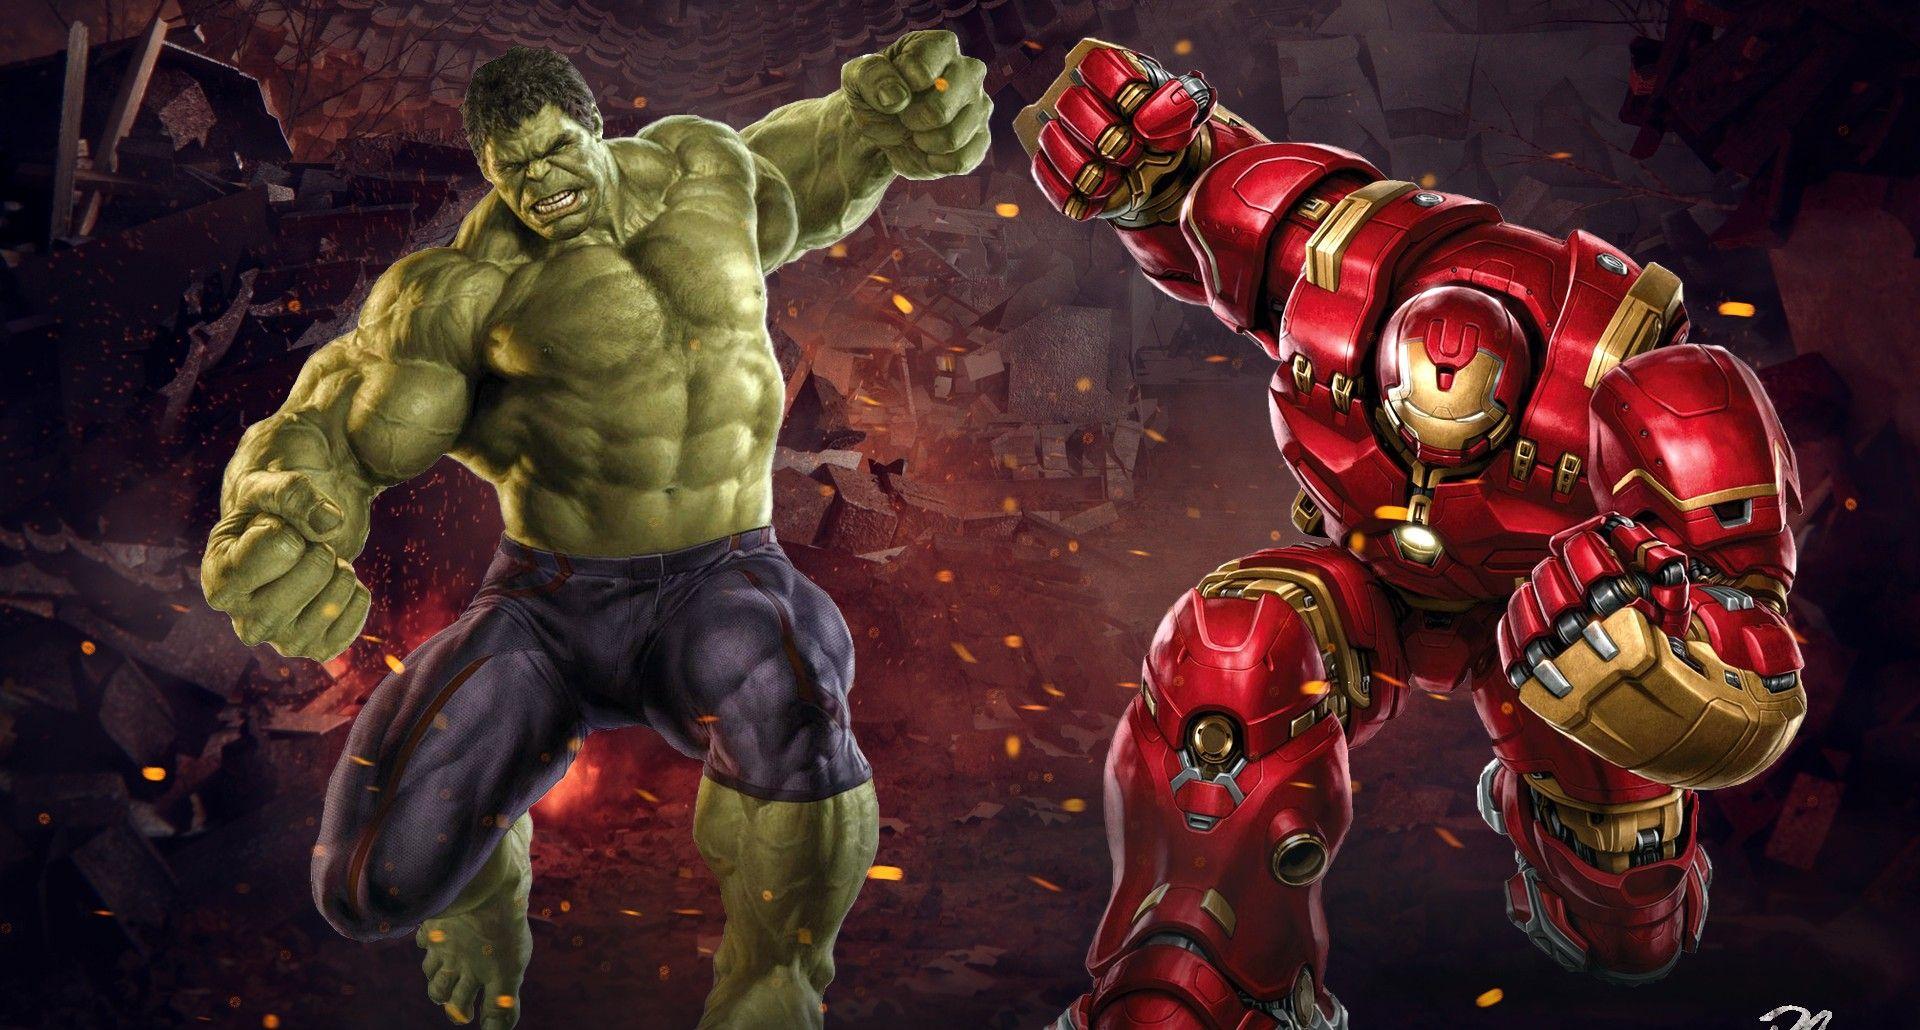 hulk-background-free-hulk-category-wallpaper-wpc5806143